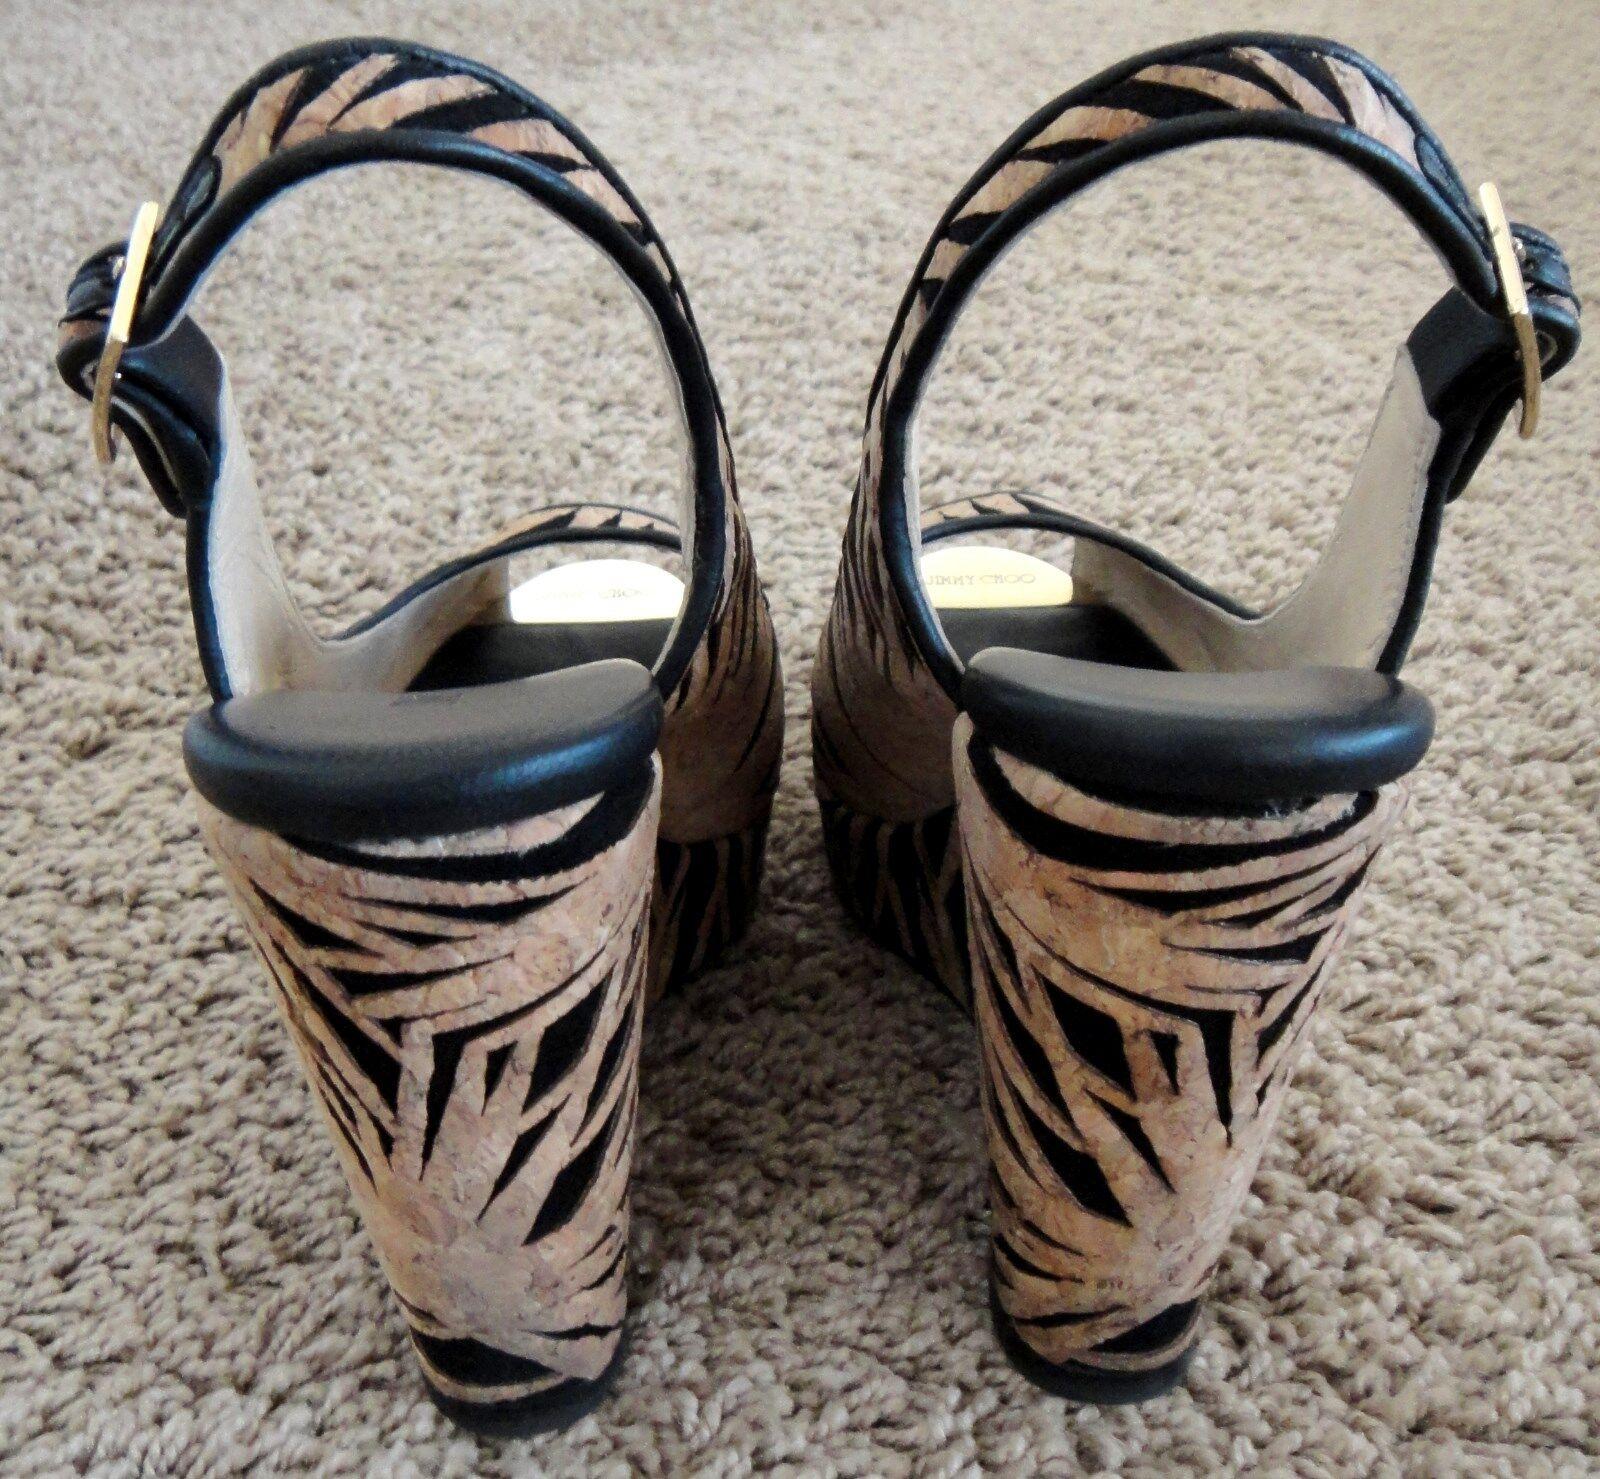 Jimmy Choo black tan laser cut cork suede slingback platform platform platform wedge heels 36 bdcec2